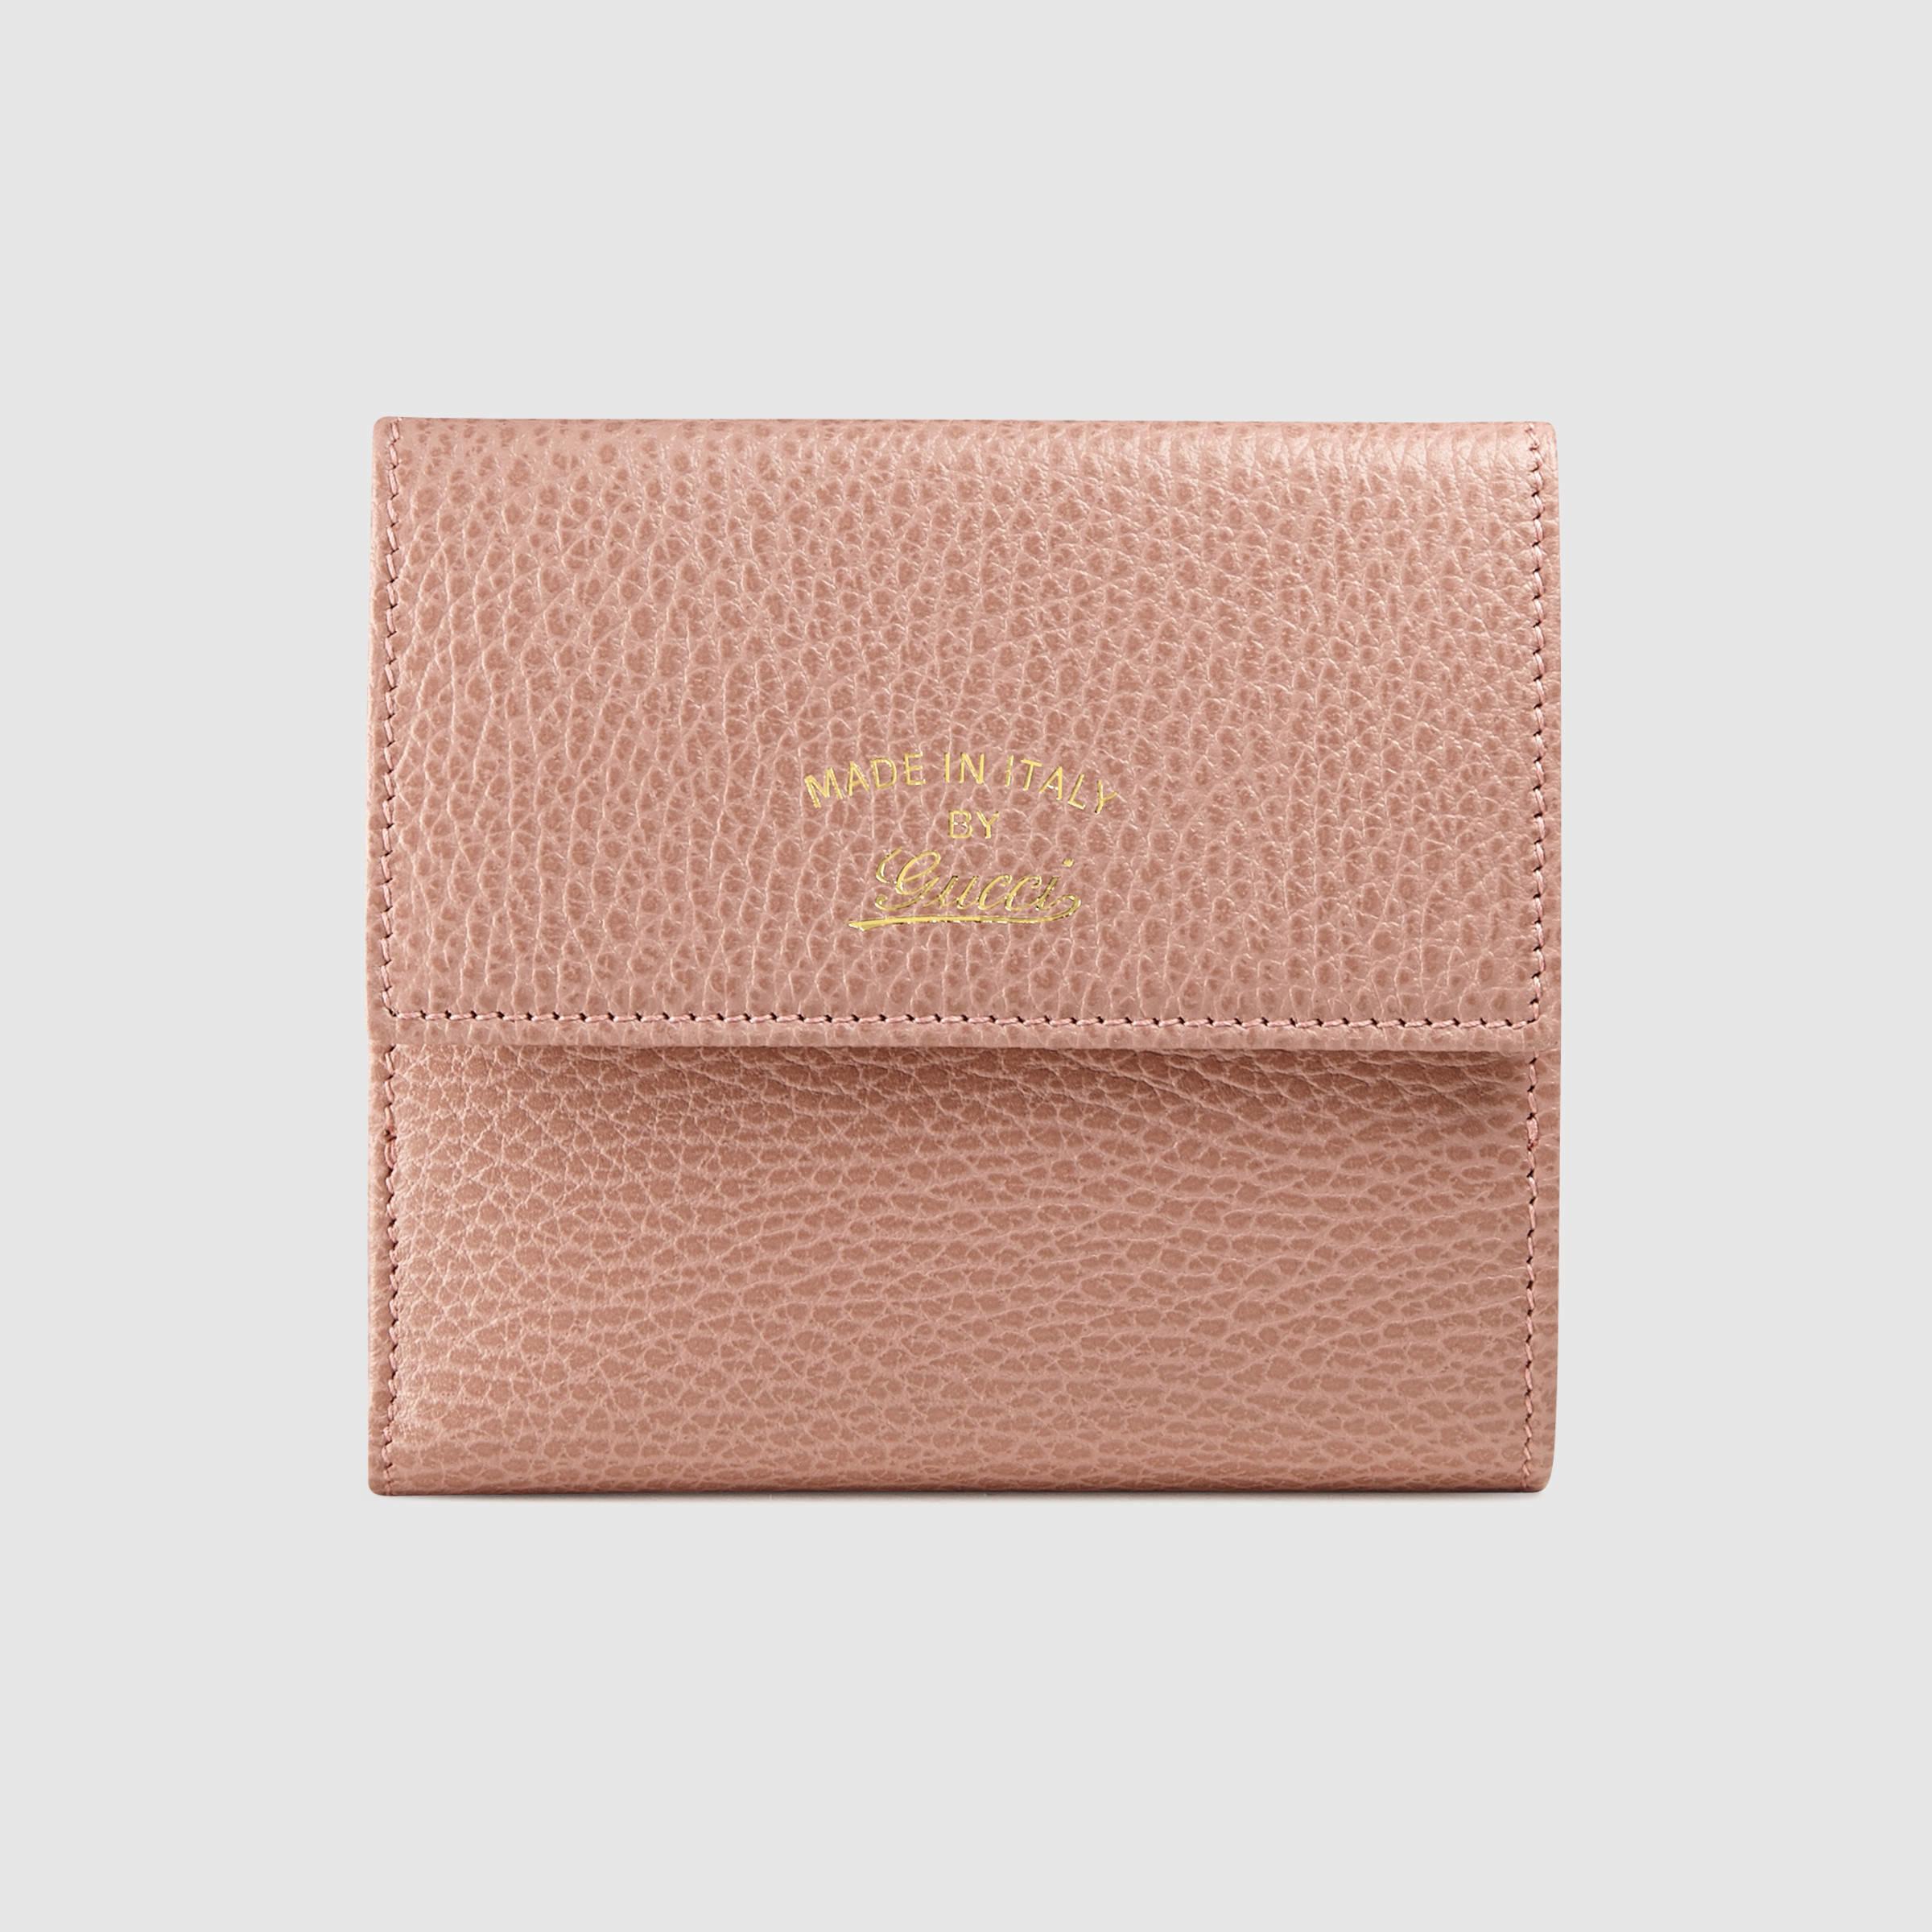 5eb9696de674 Gucci Swing French Flap Wallet in Pink - Lyst